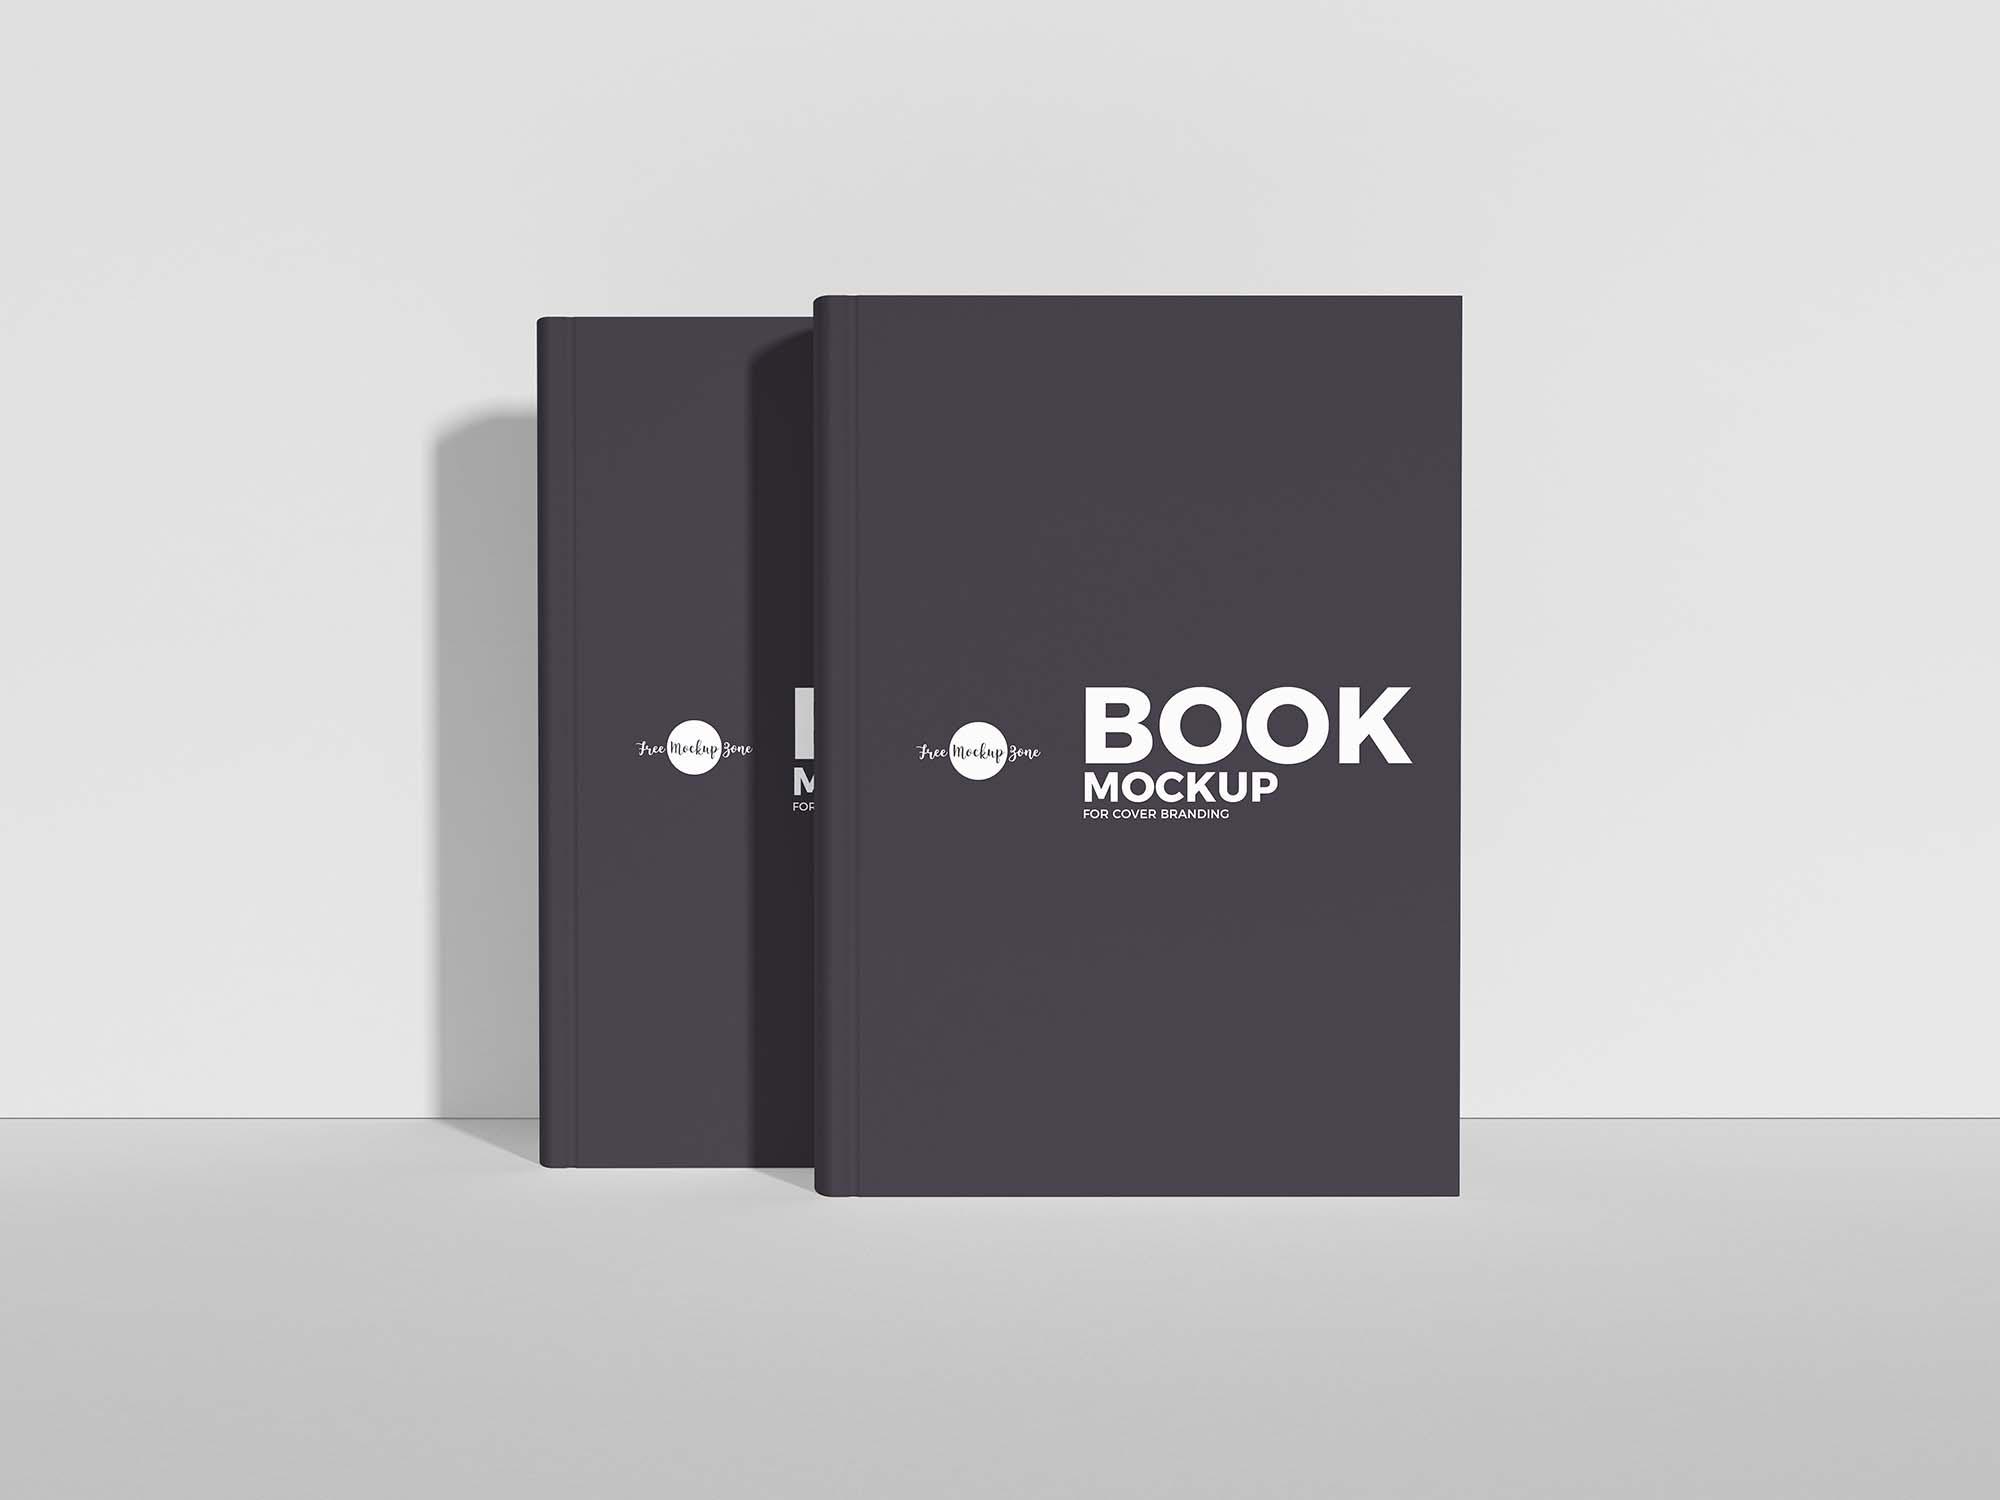 Book Cover Branding Mockup 2